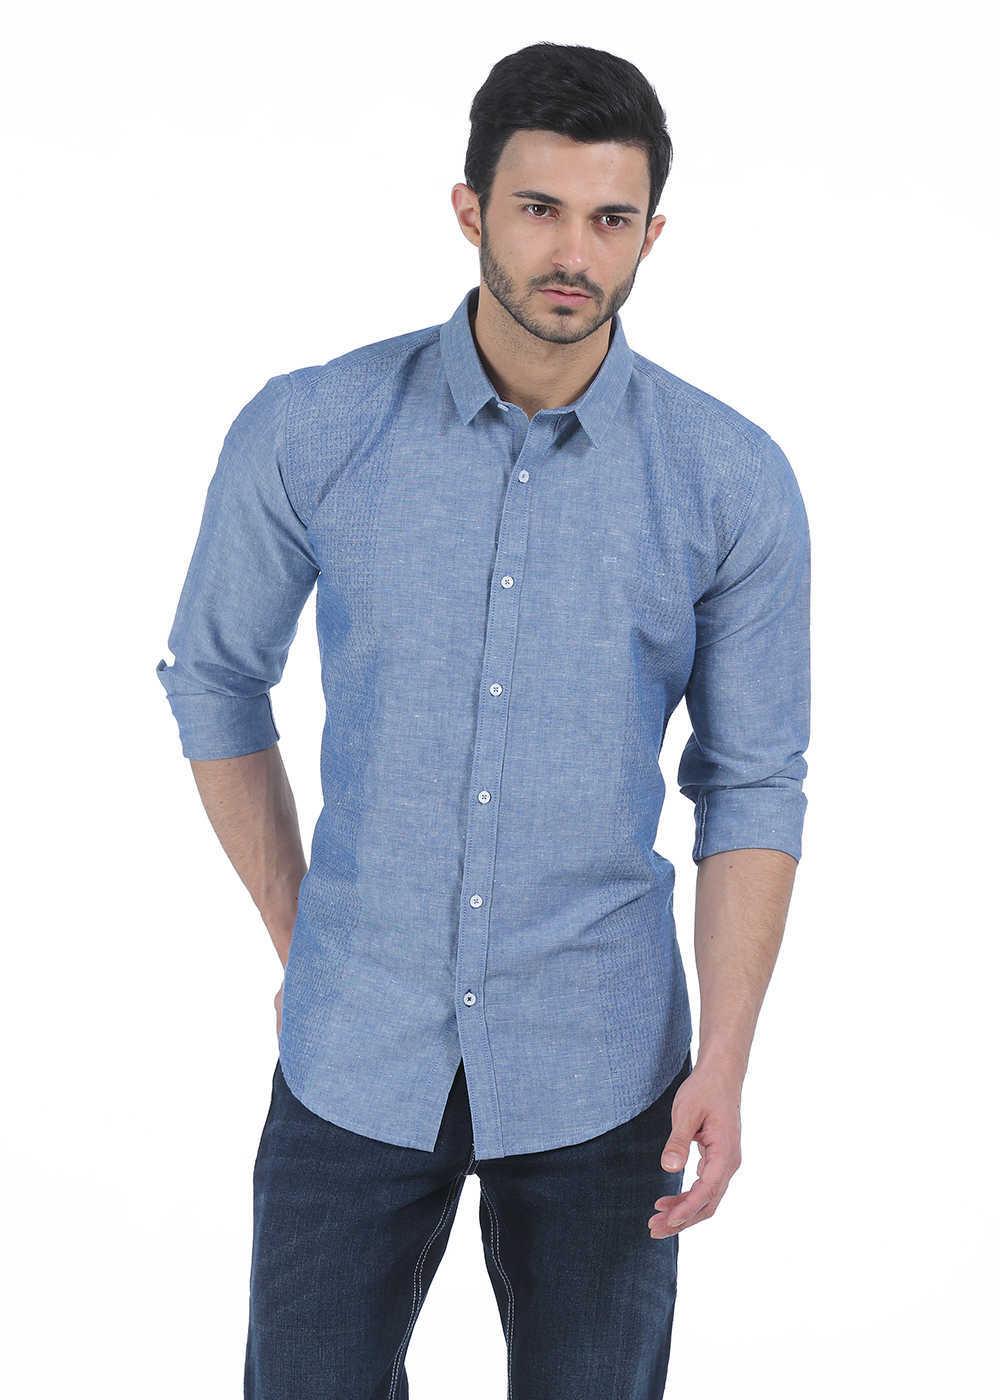 Basics | Basics Slim Fit Dusty Blue Chambray Combination Shirt